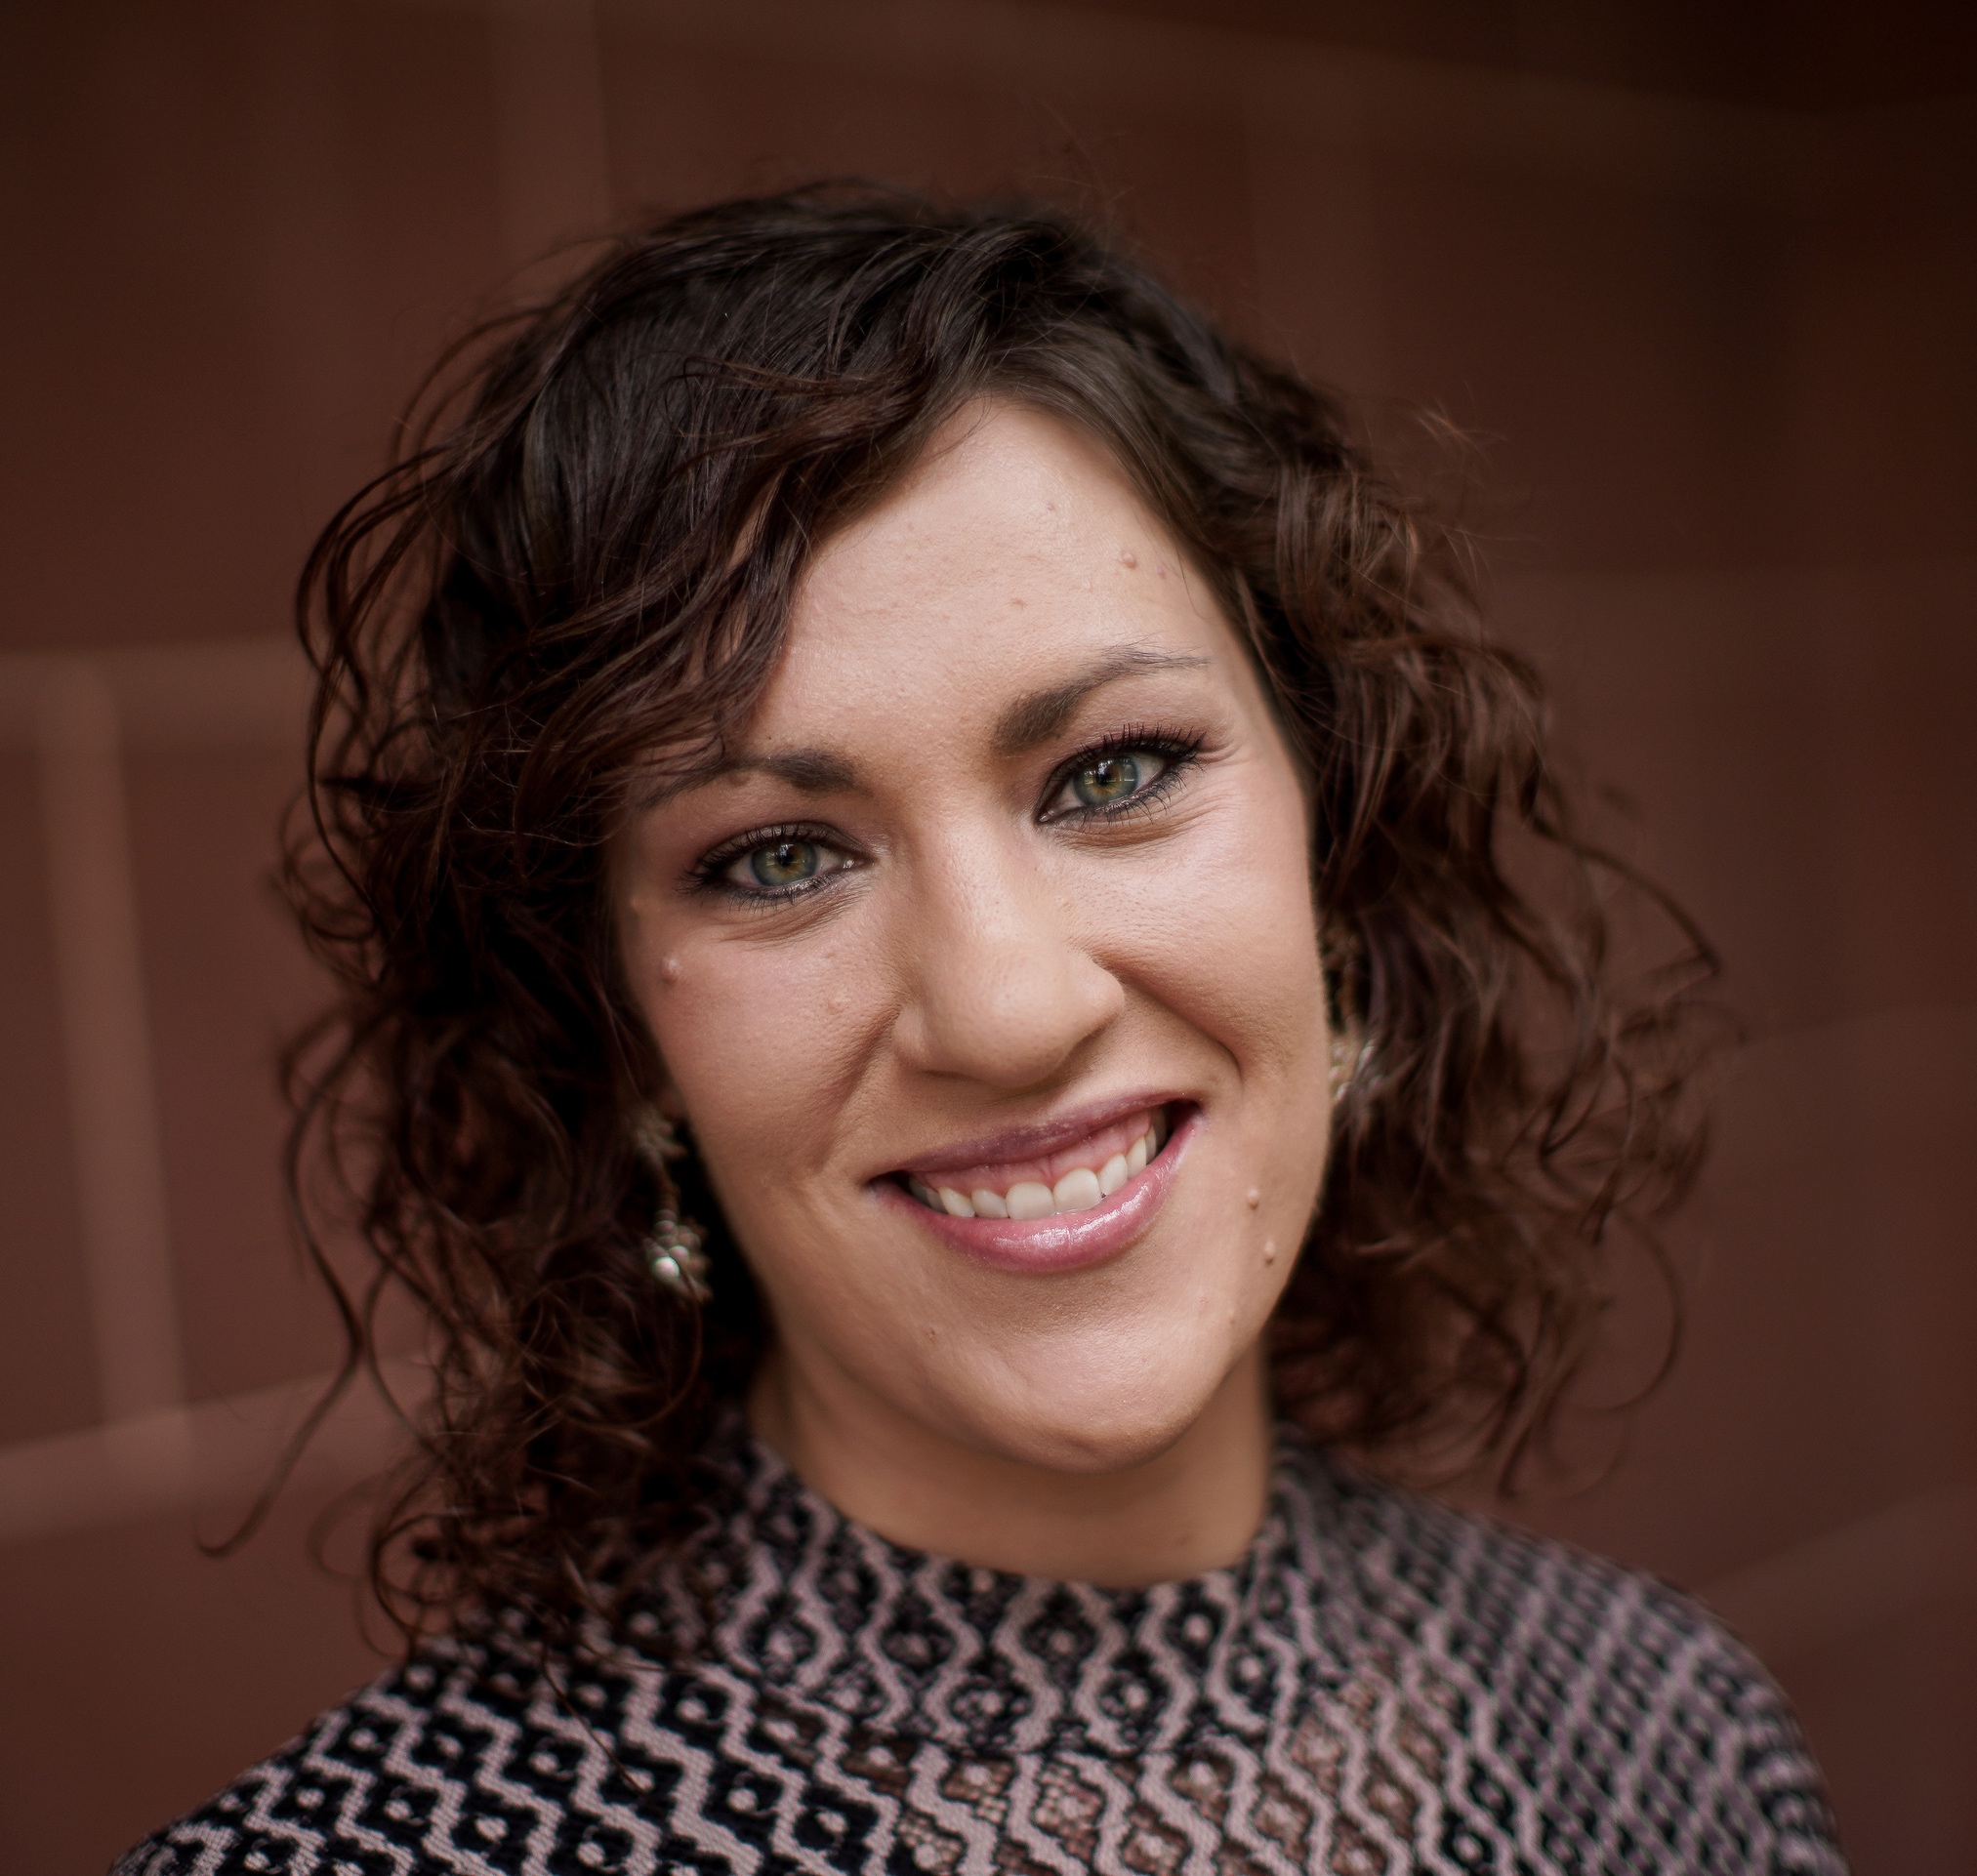 Rachel Sterzer Gibson